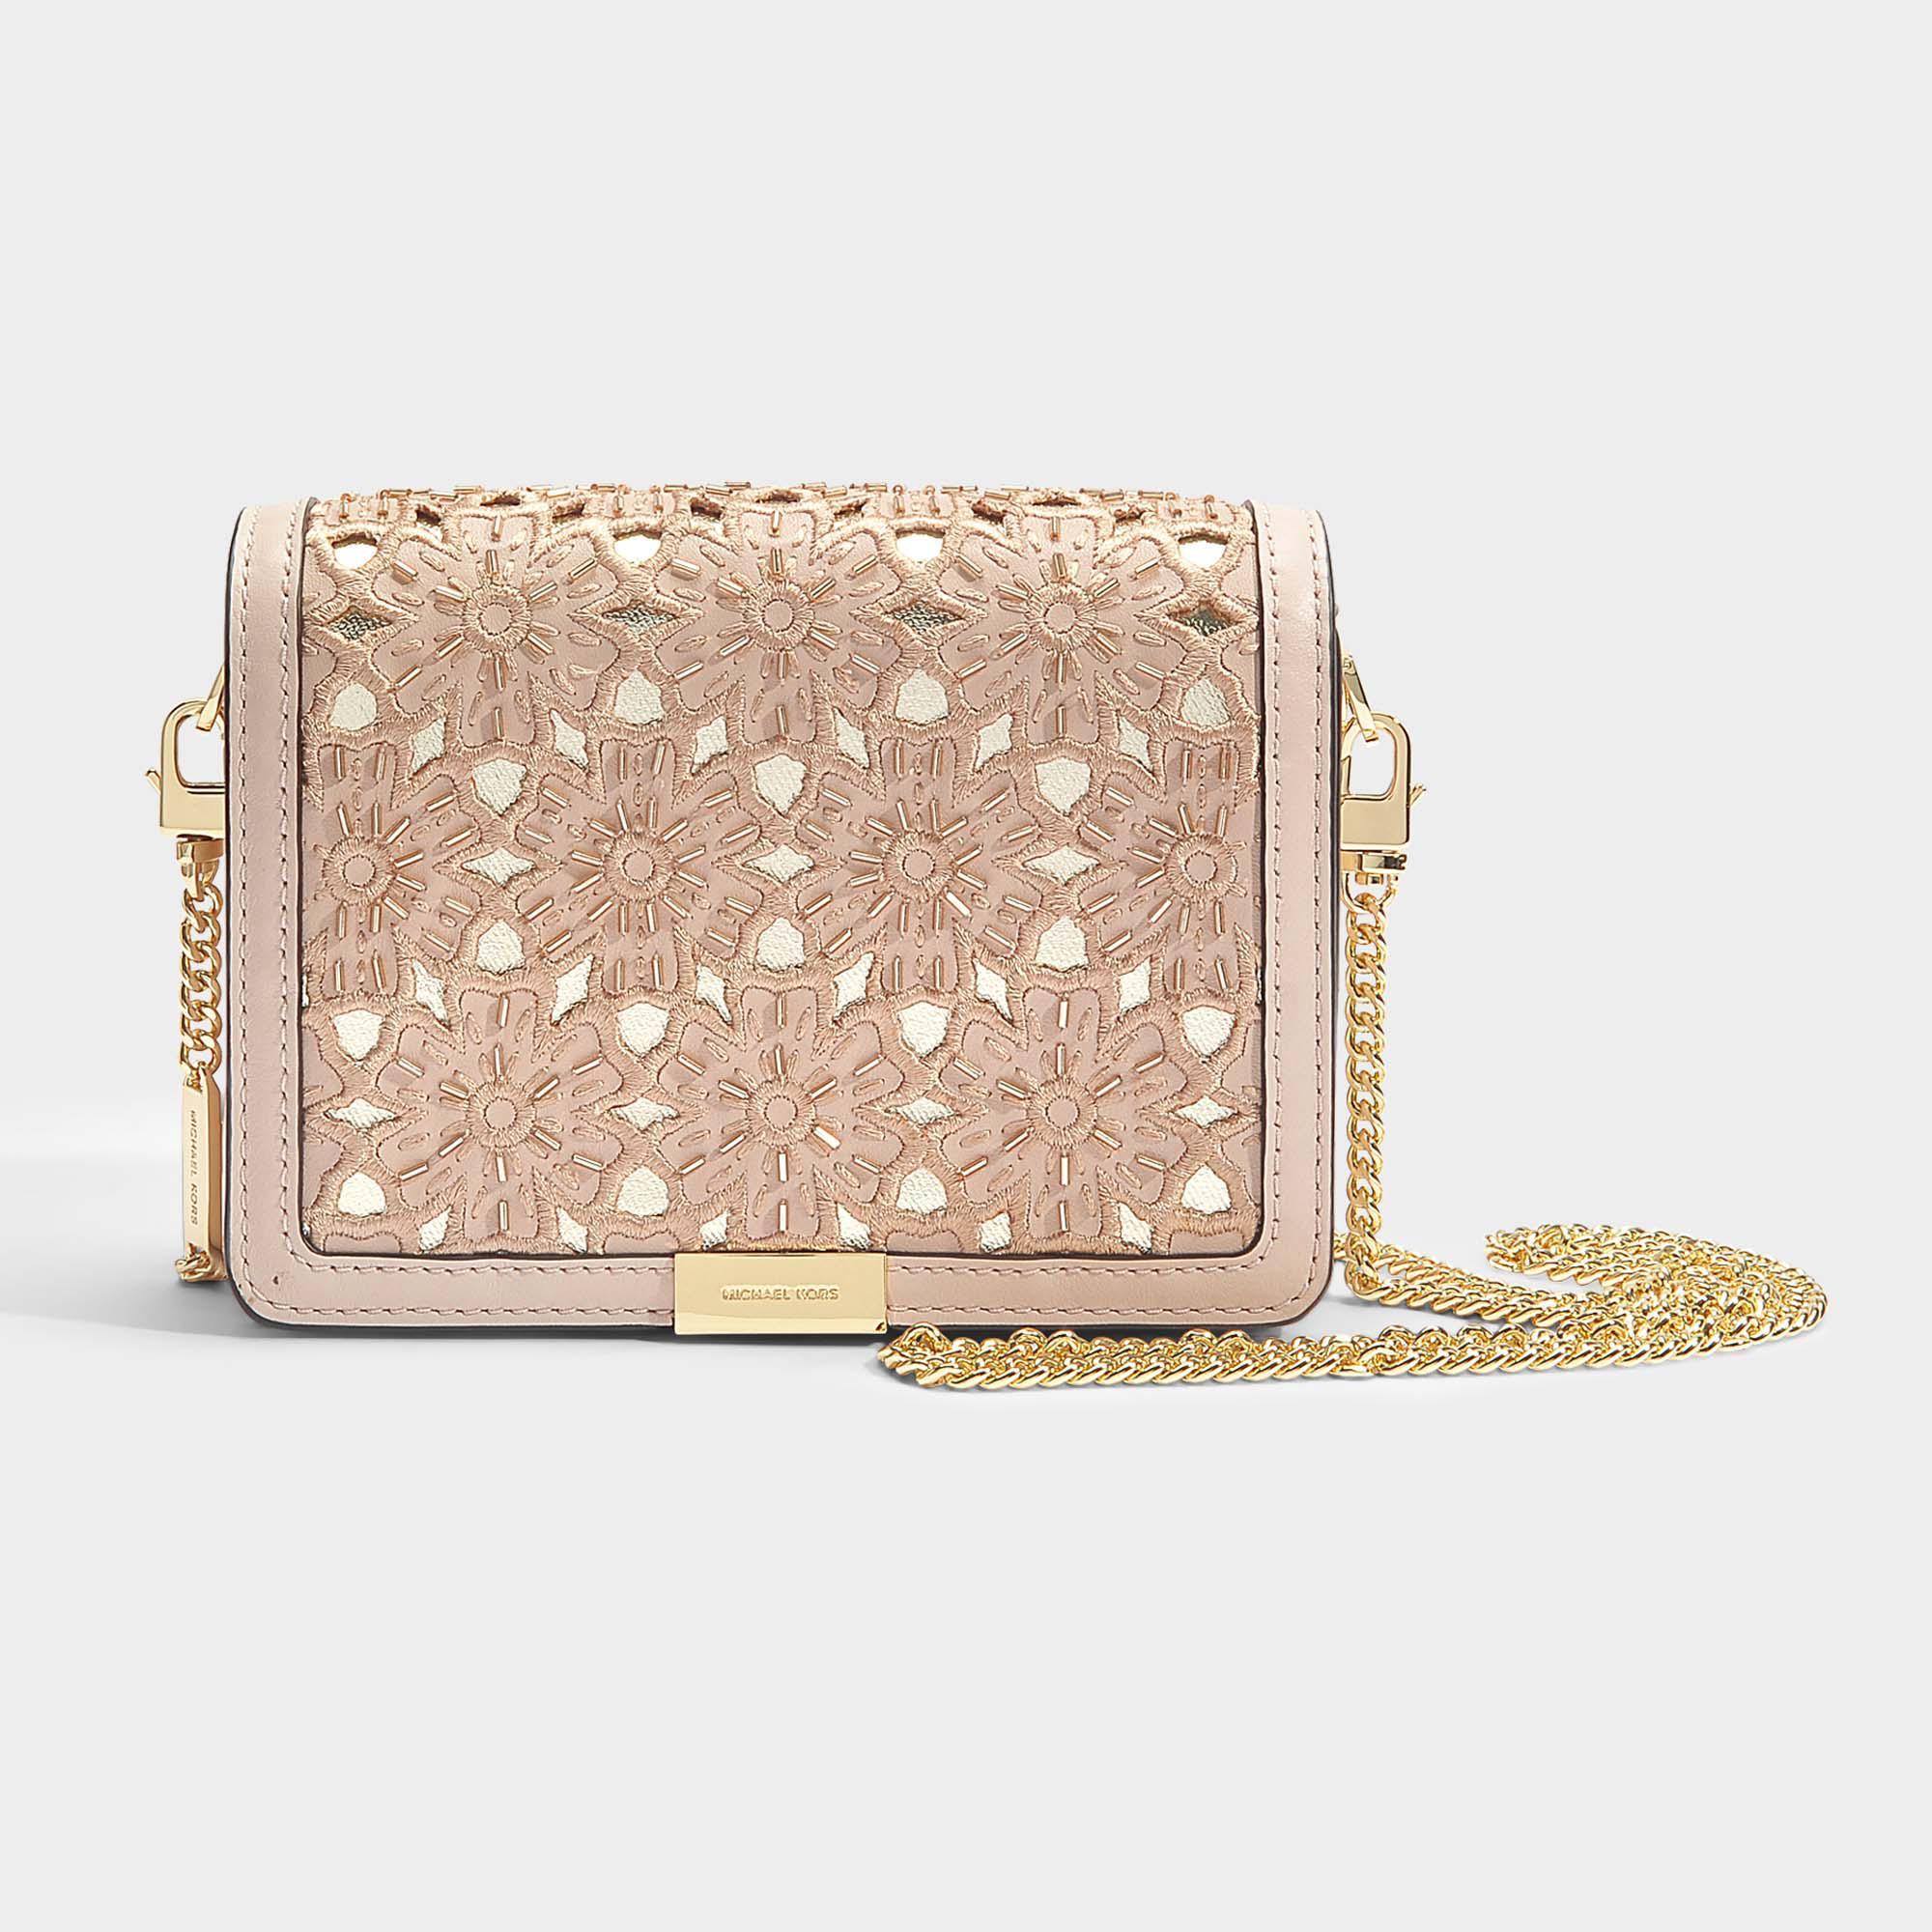 3f32f2dad702 Lyst - MICHAEL Michael Kors Jade Medium Gusset Clutch In Soft Pink ...